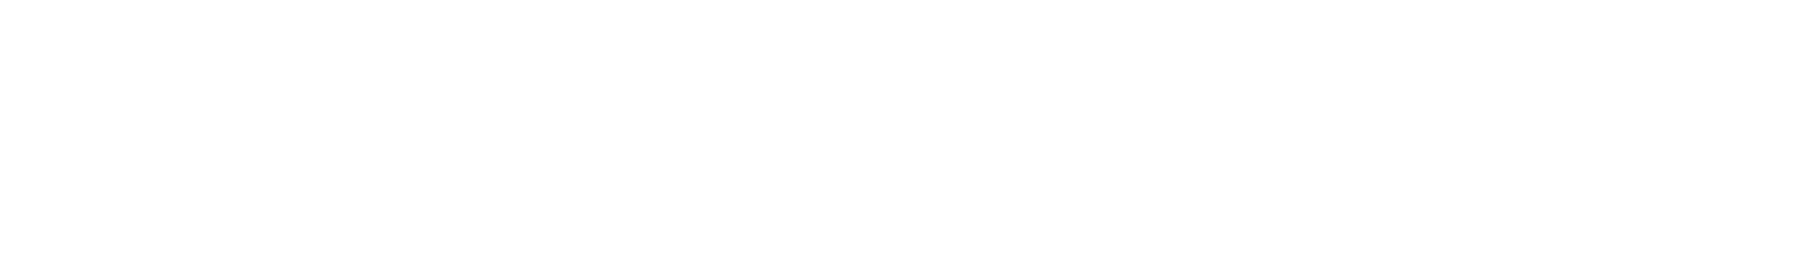 g abs05 082